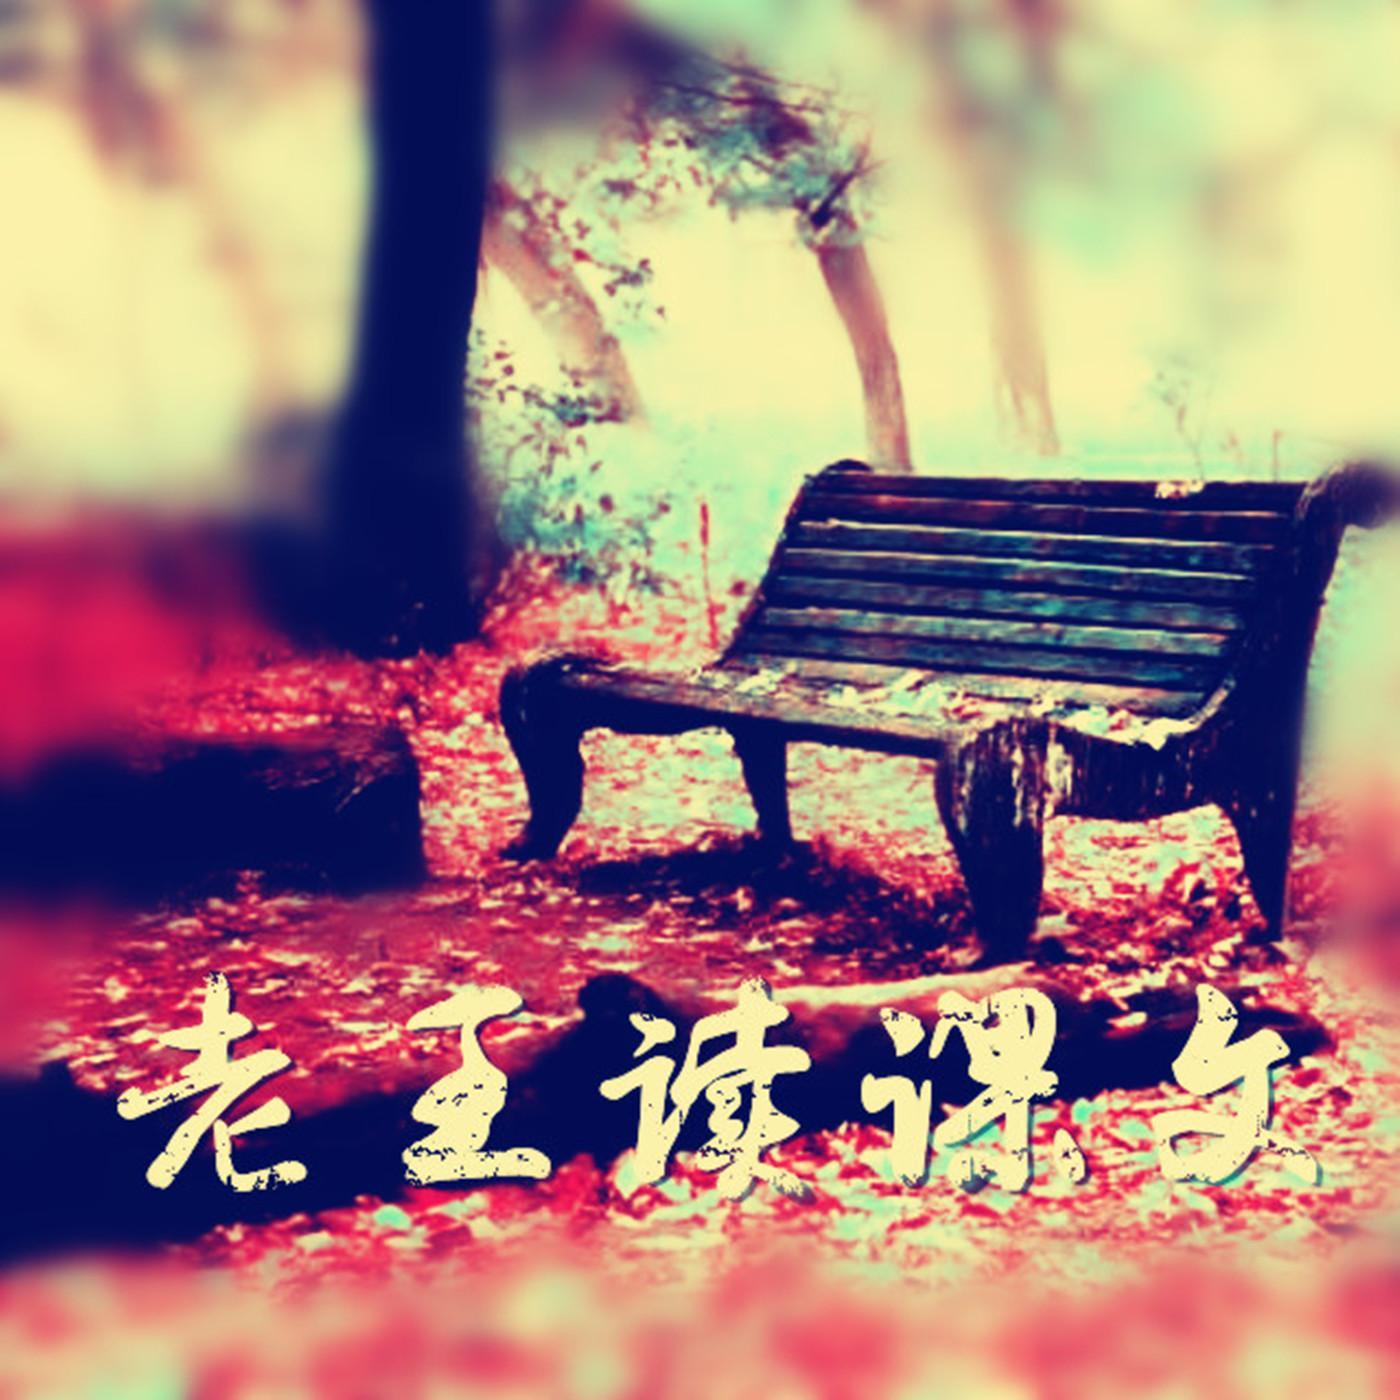 <![CDATA[老王读课文]]>